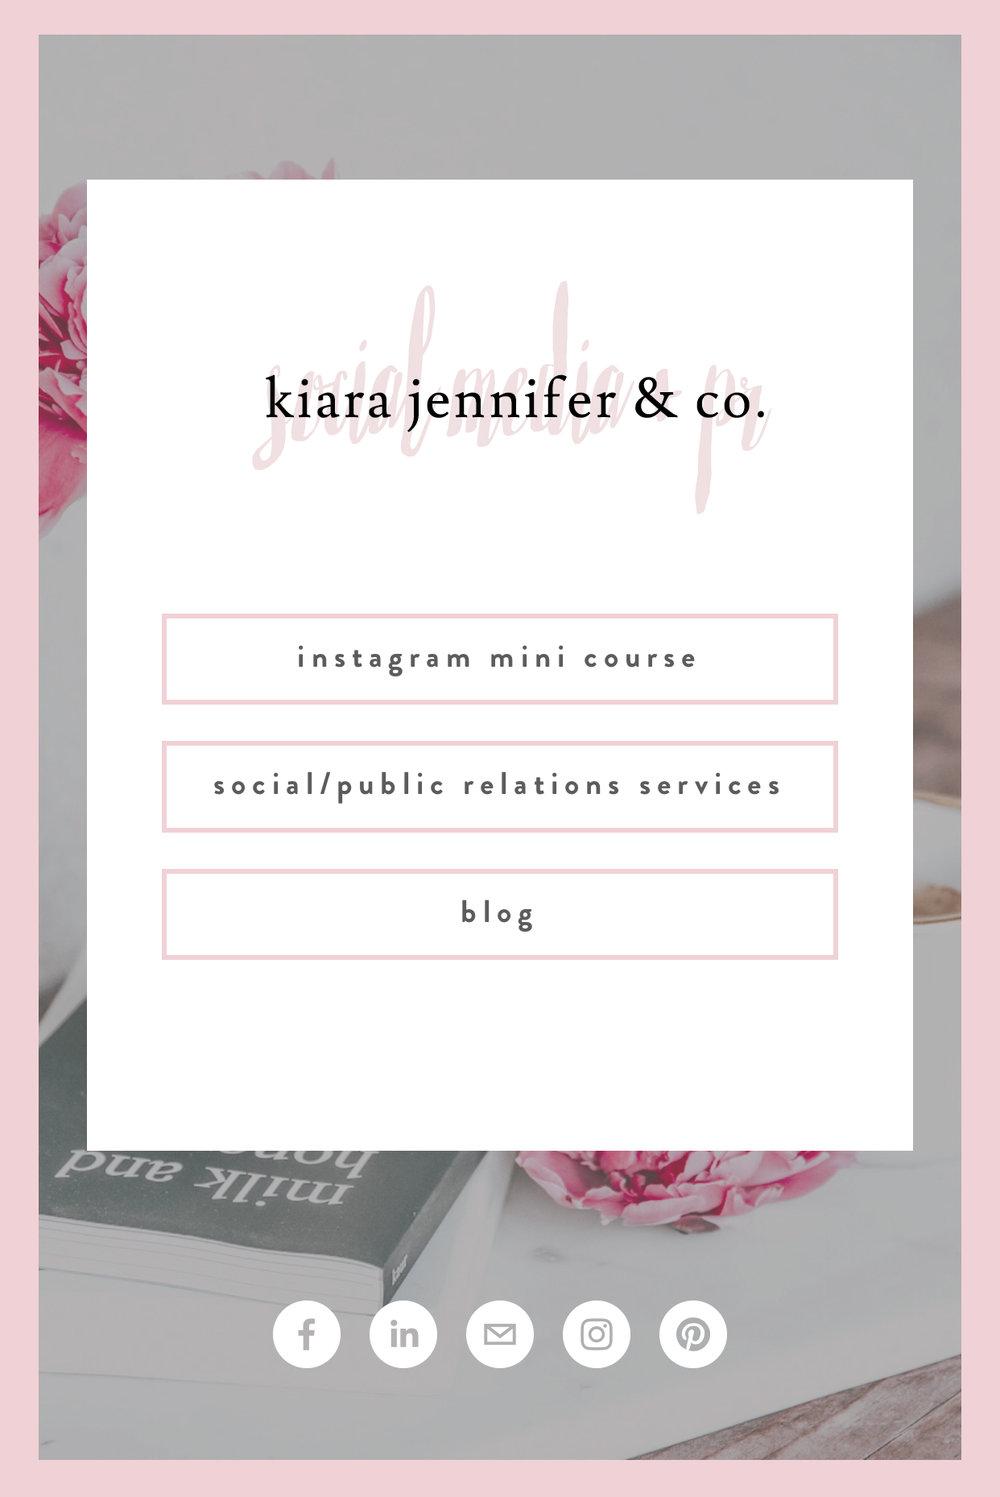 Social Media Linktree Instagram Hack   kiara jennifer and co social media marketing and public relations